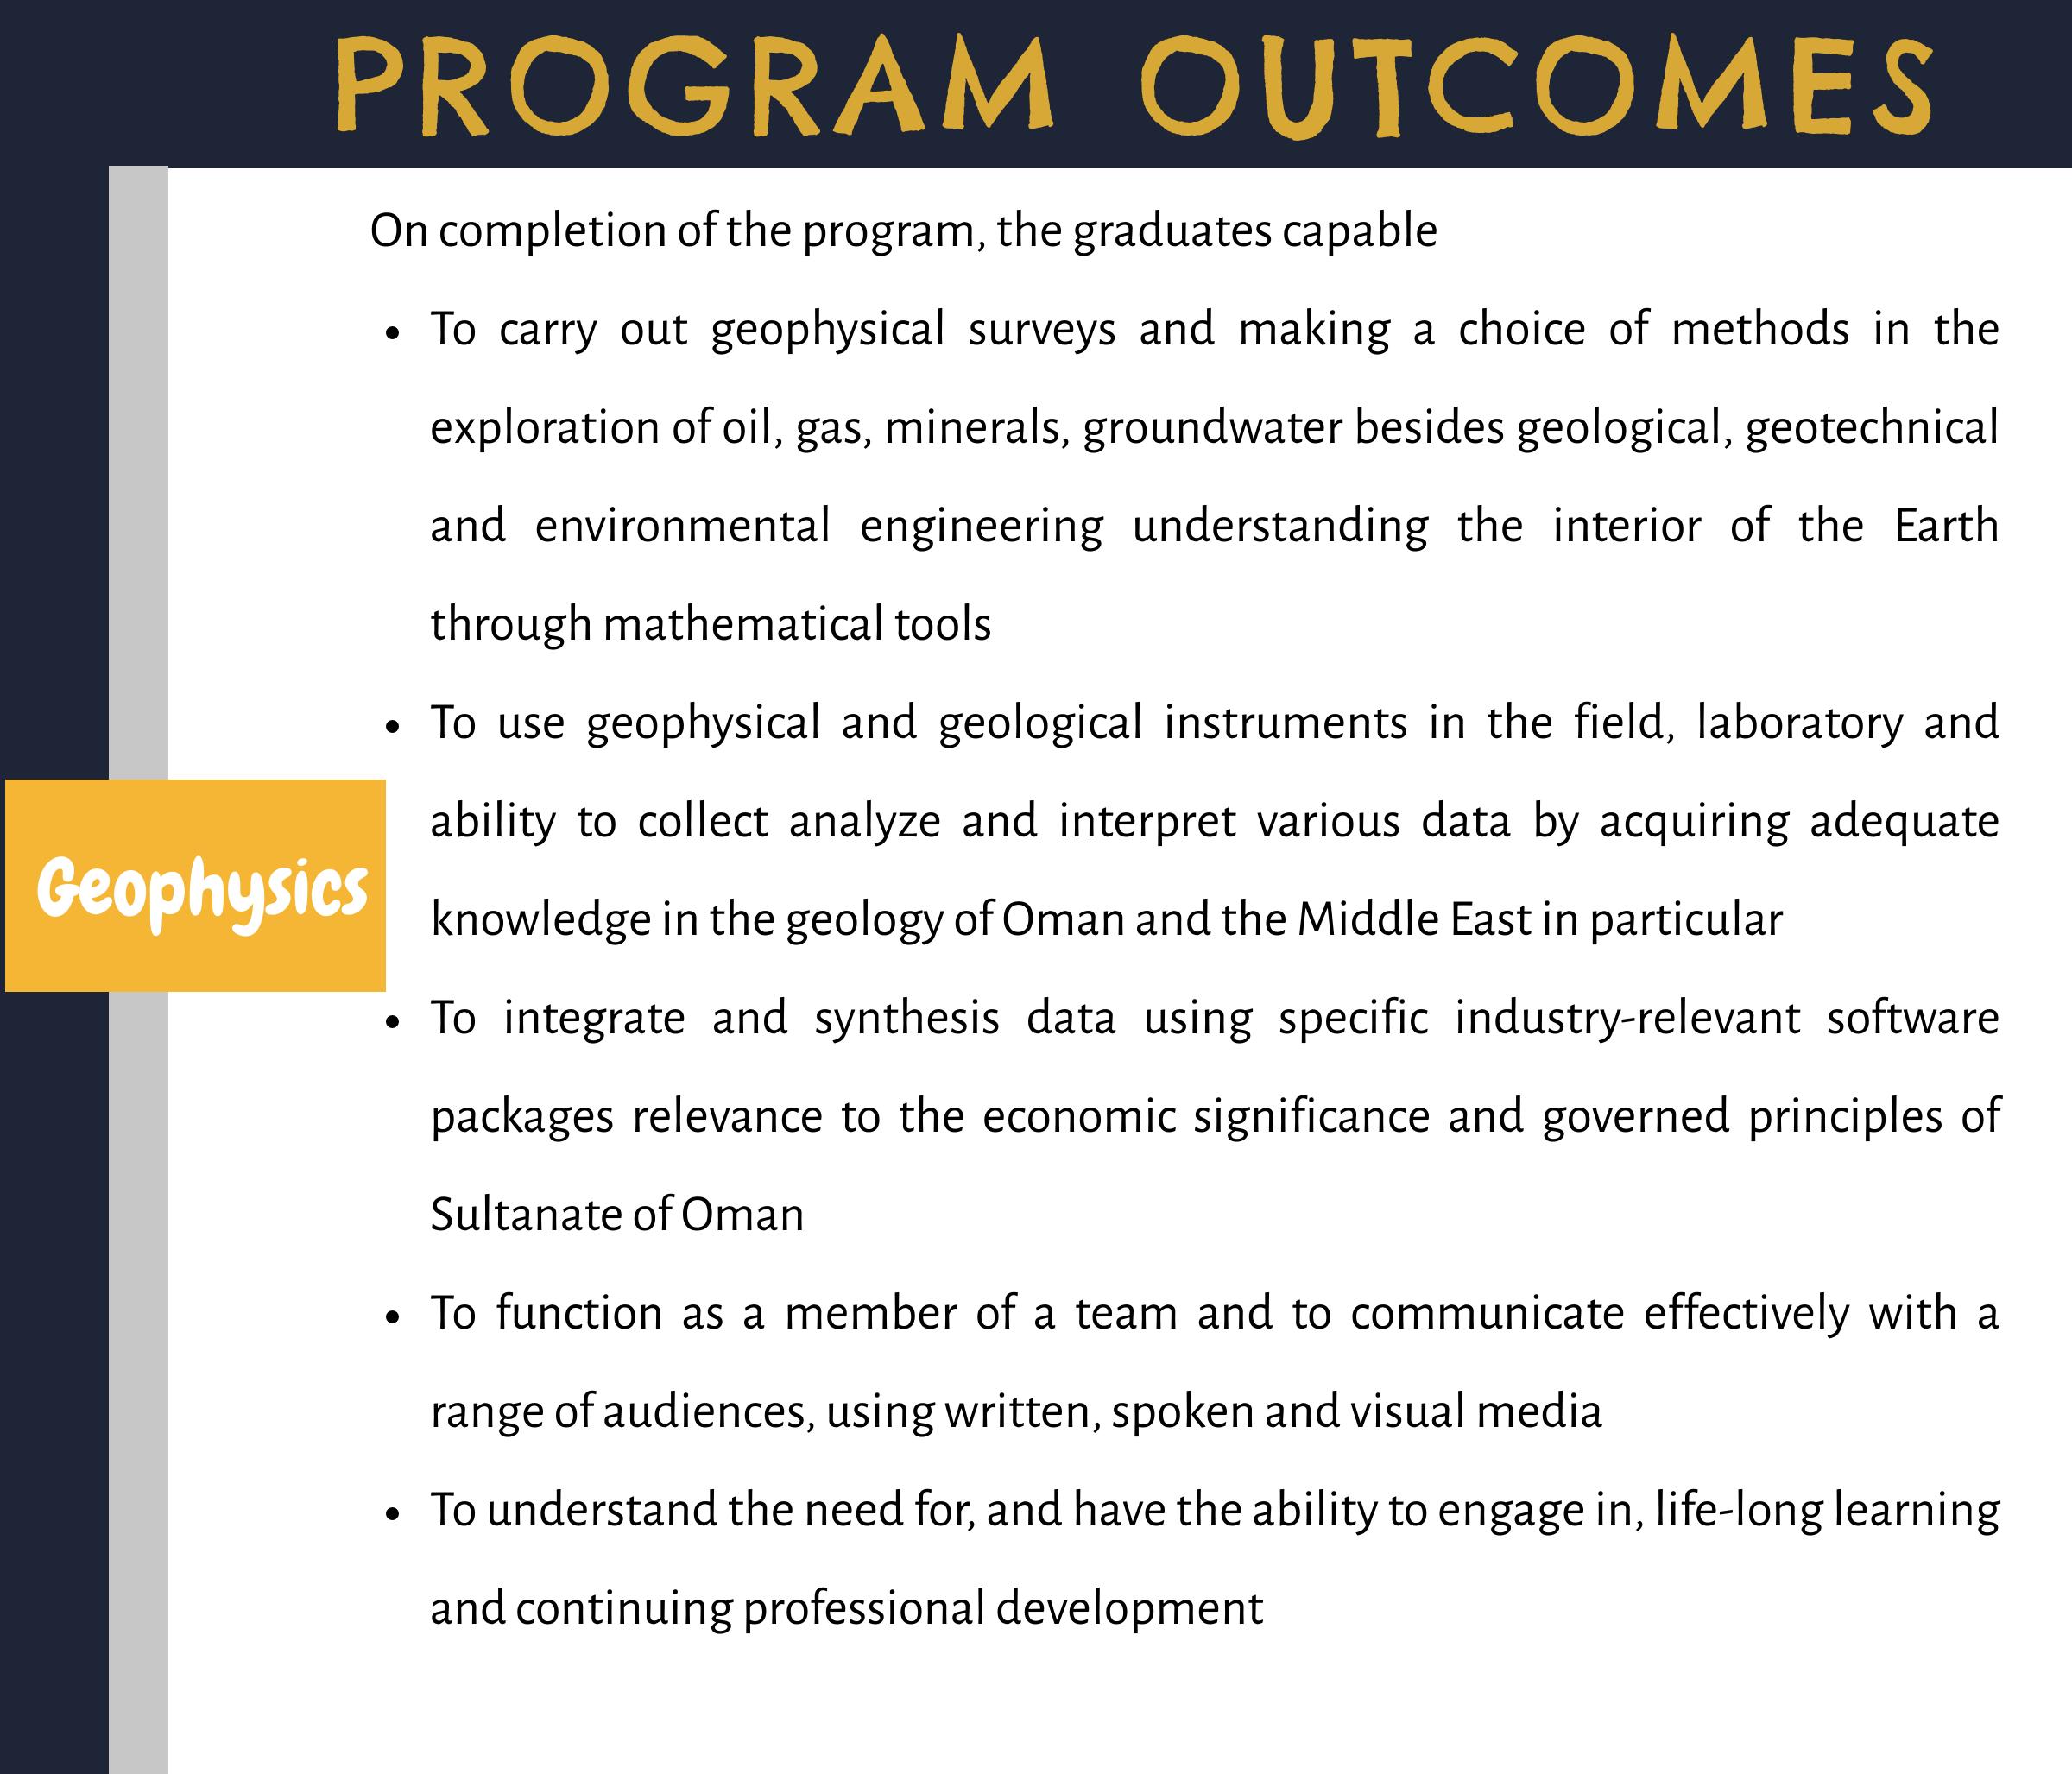 Outcomes - Geophysics